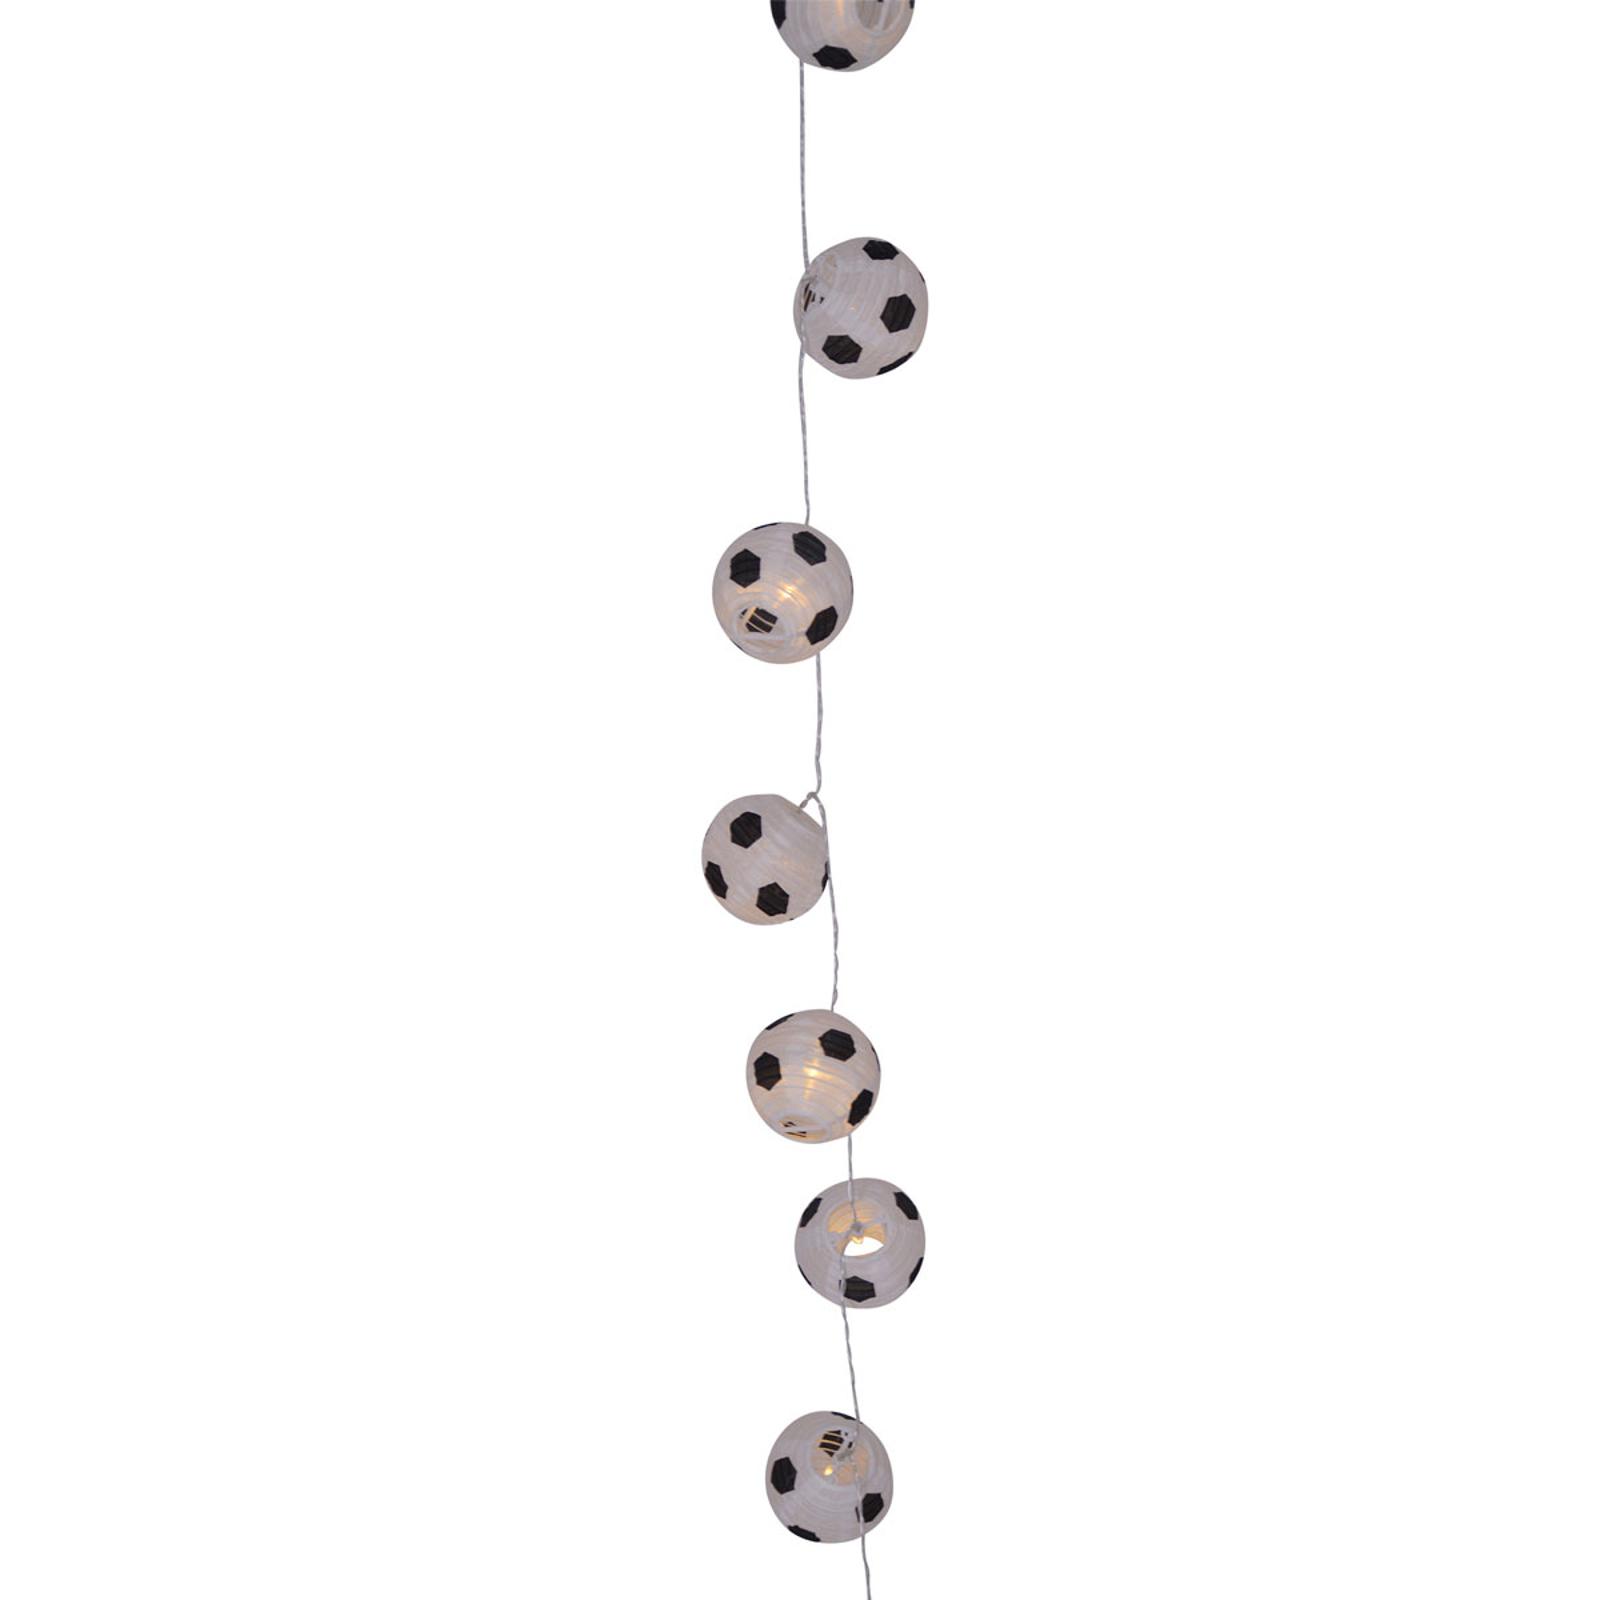 Kizi LED string lights with footballs, battery_7001005_1